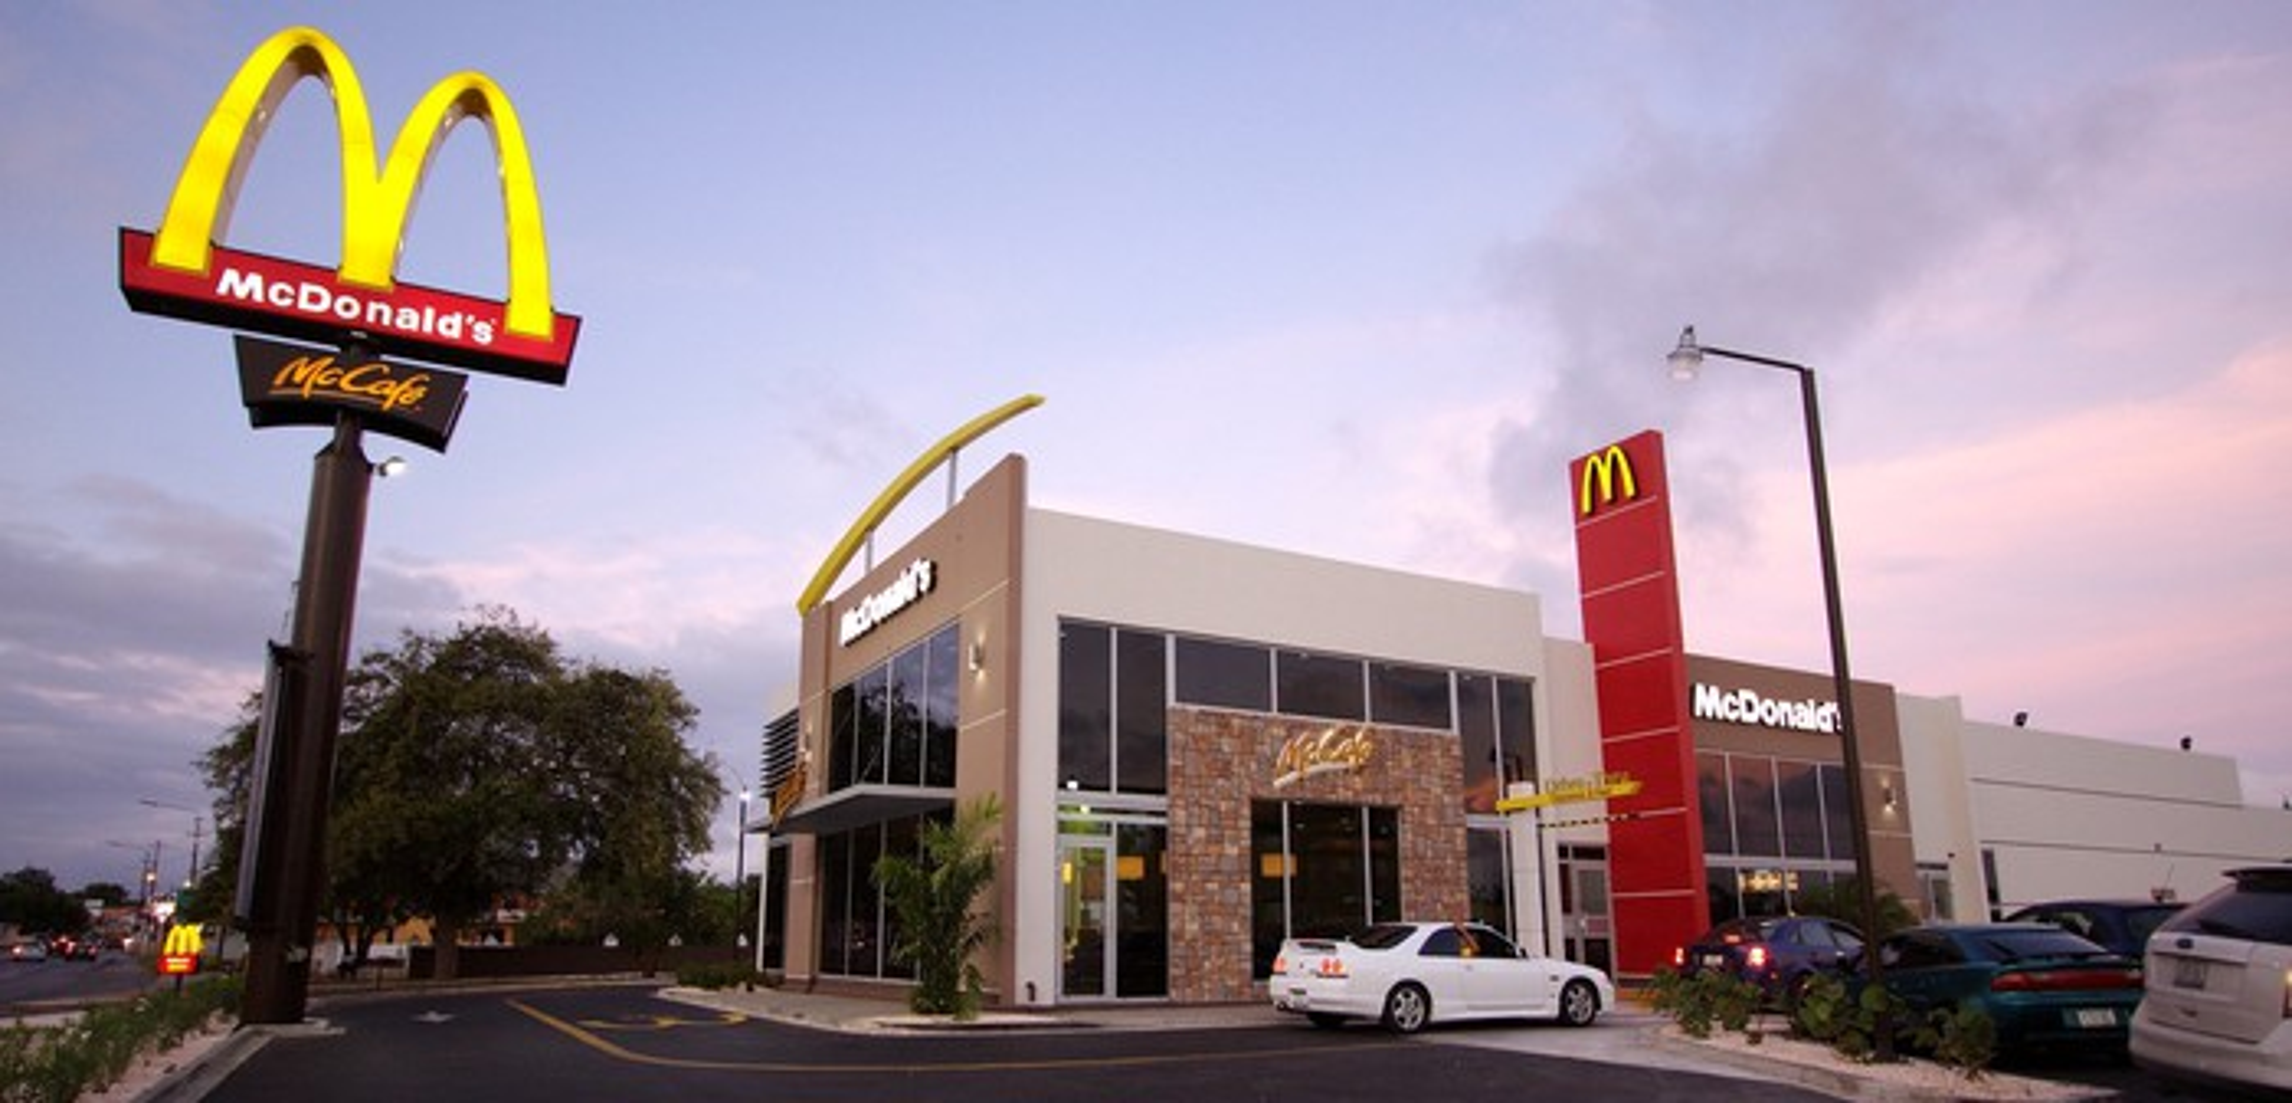 McDonald's location in Curacao